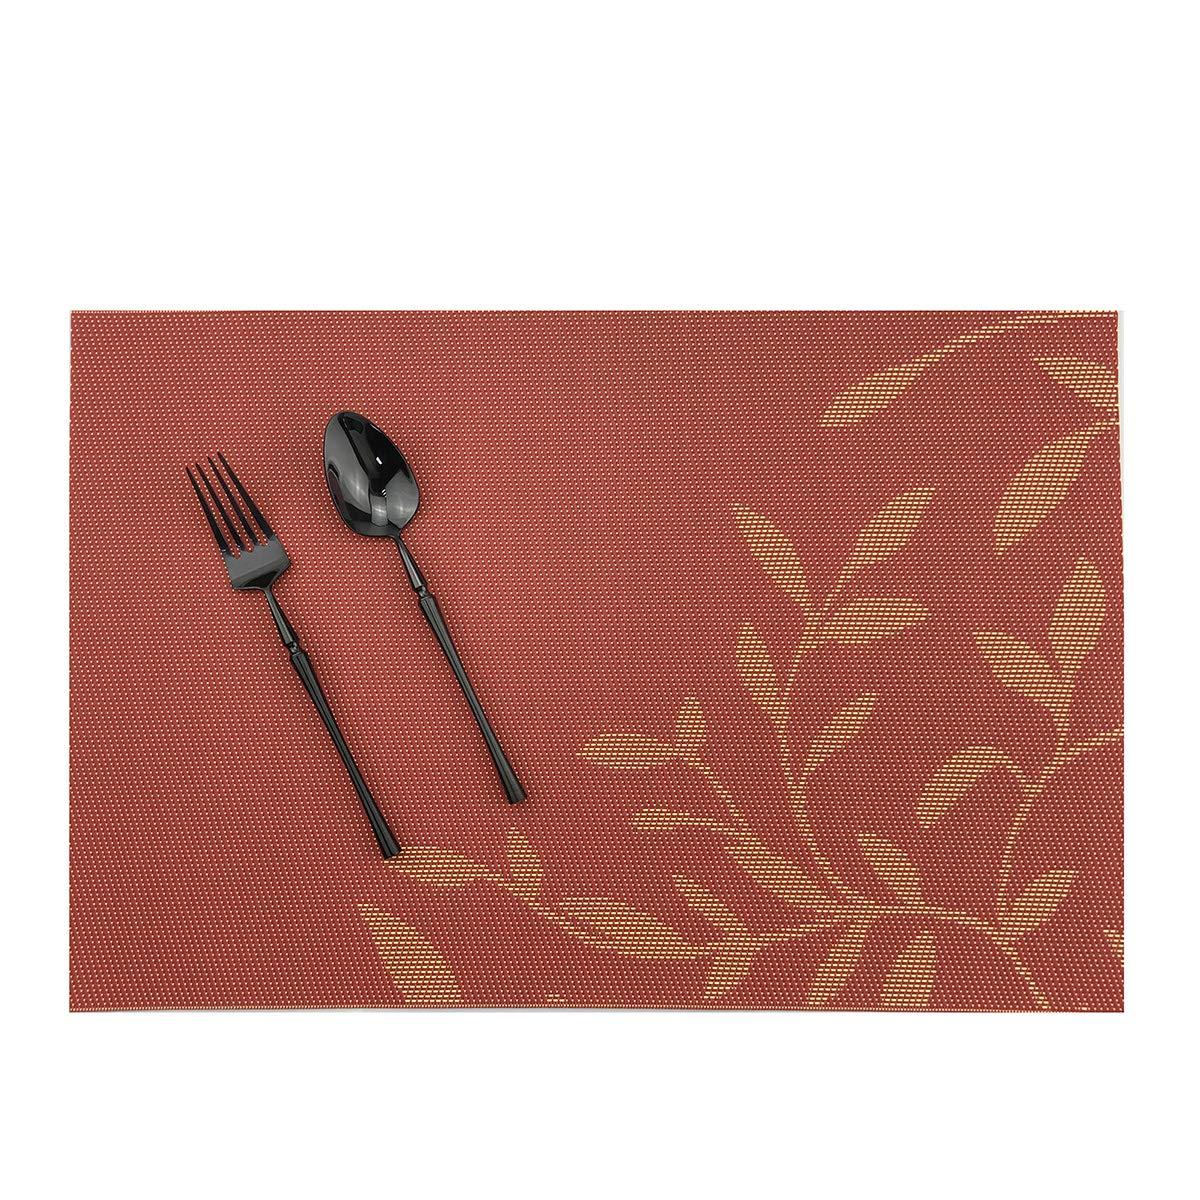 Kitchens Silicone Pot Holder/&Trivet Heatproof Heat Resistant Non-Slip Mats T gE